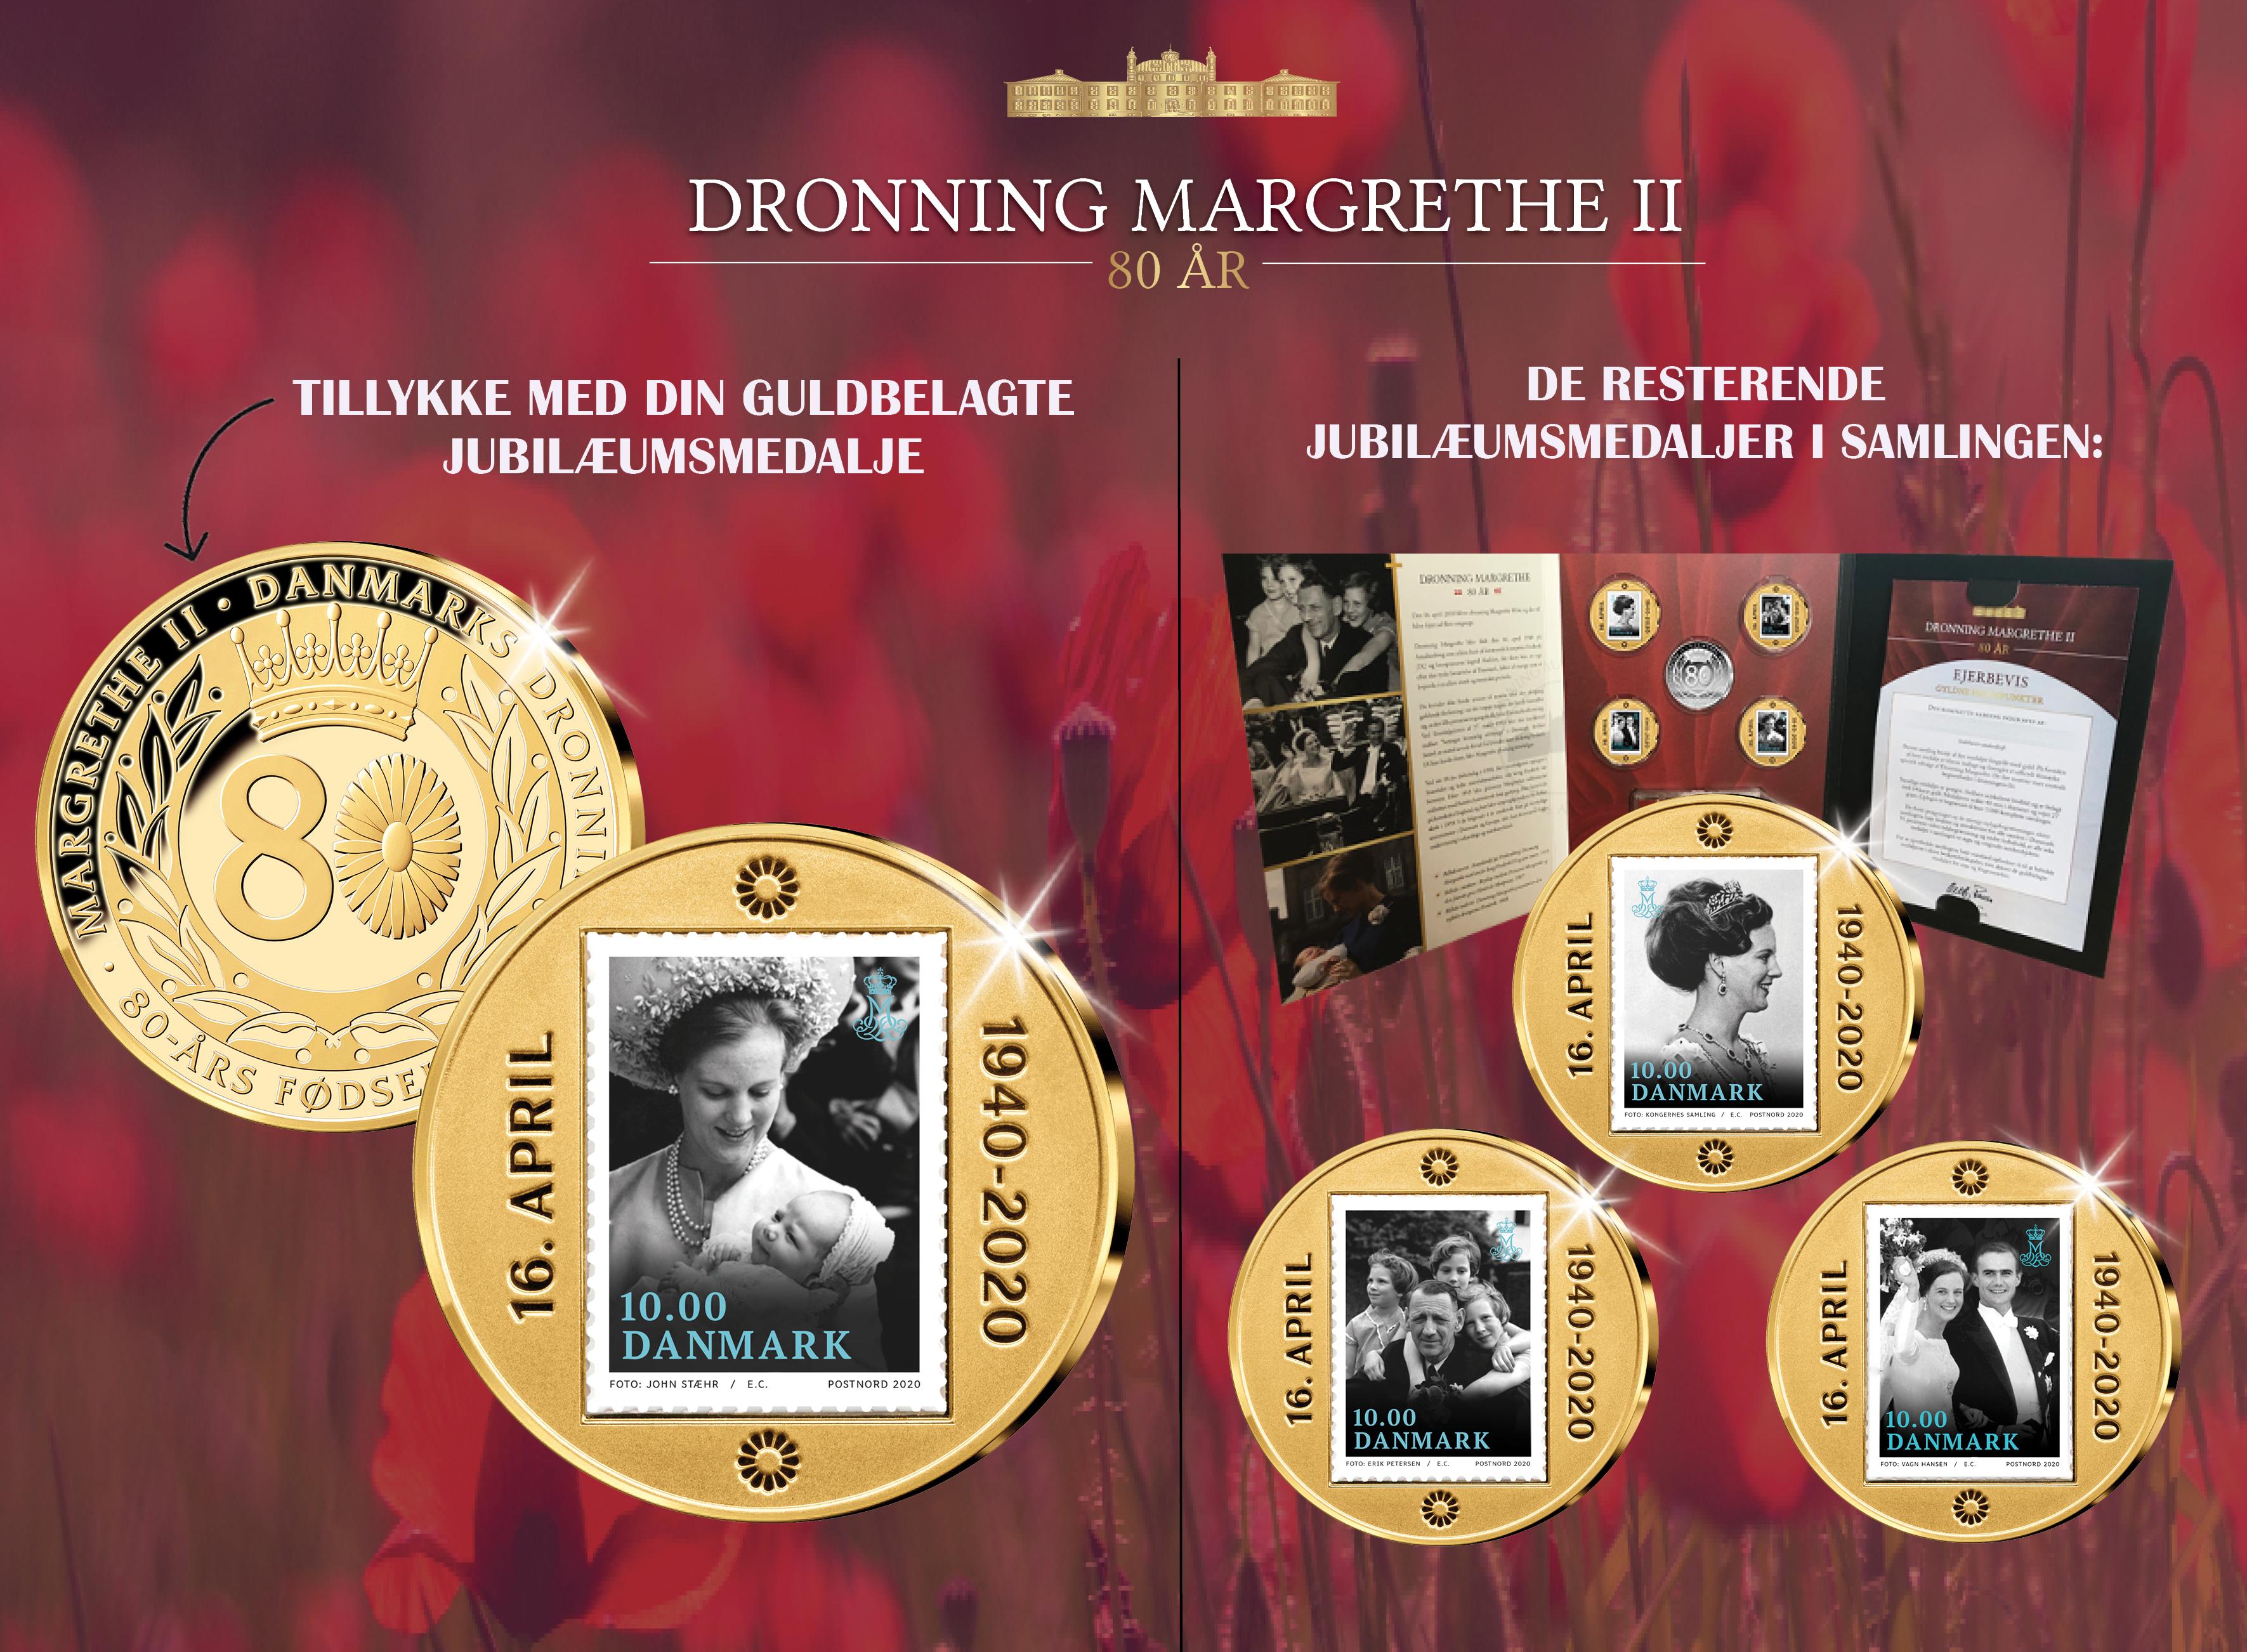 Dronning Margrethe 80 år - Gyldne højdepunkter 1940-2020